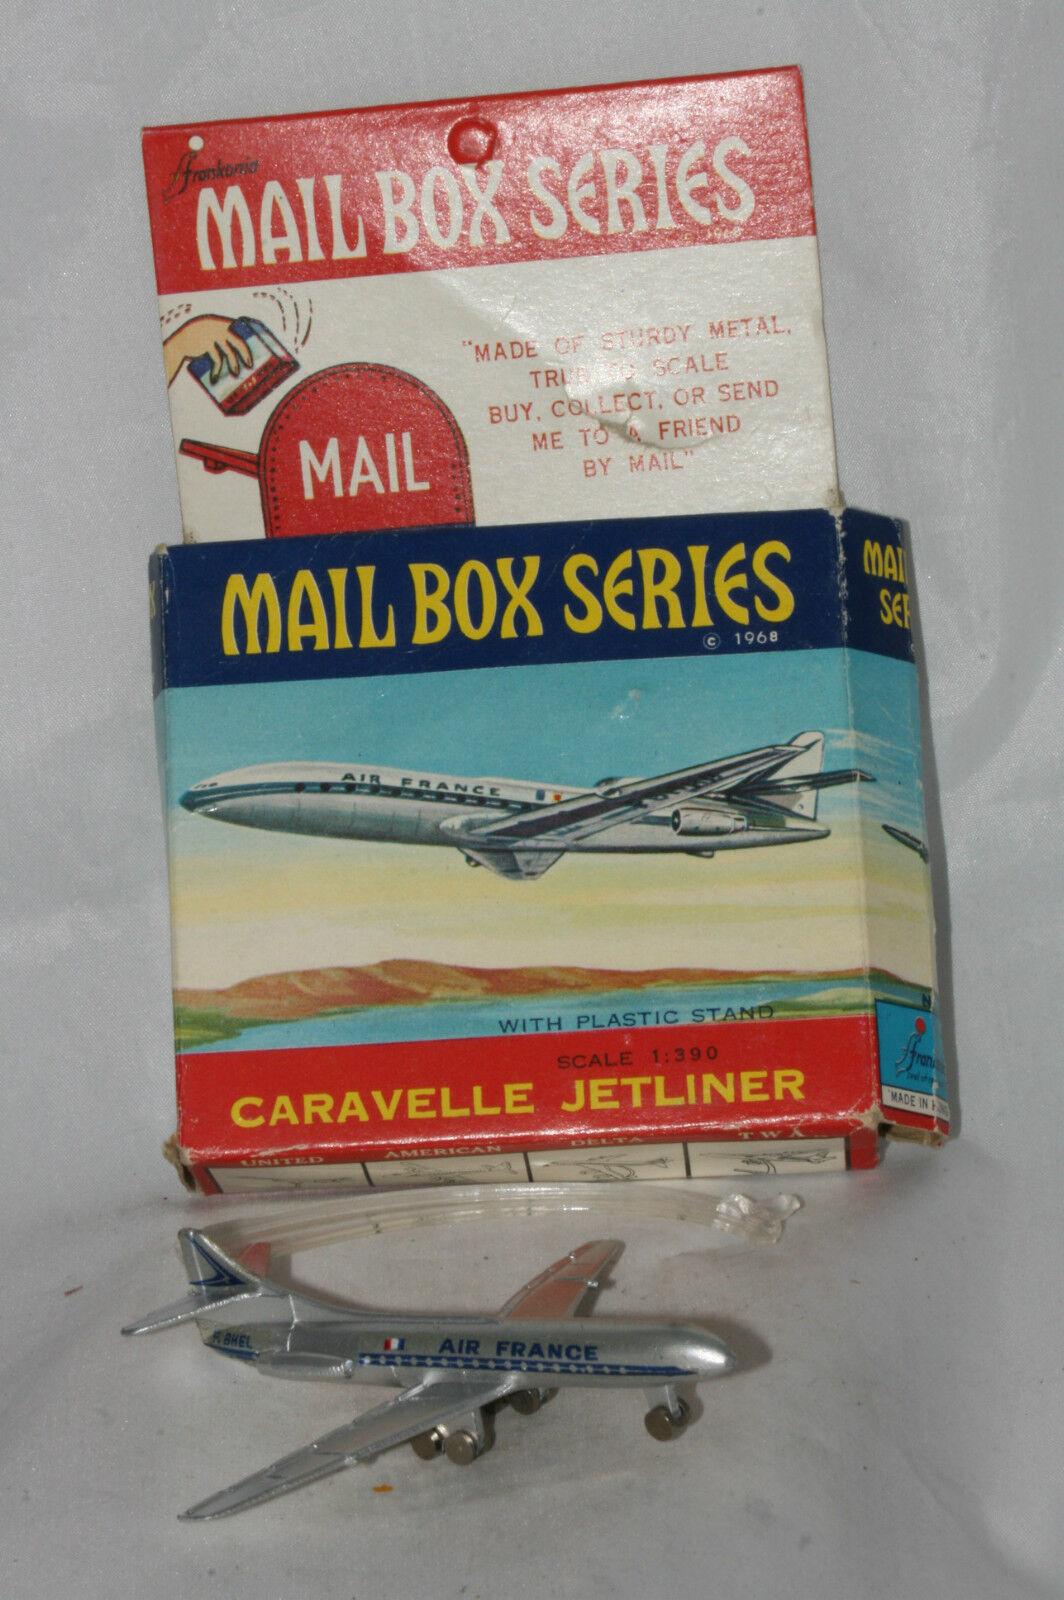 Frankonia Mail låda Series Air France bilavelle Jetliner, ruta